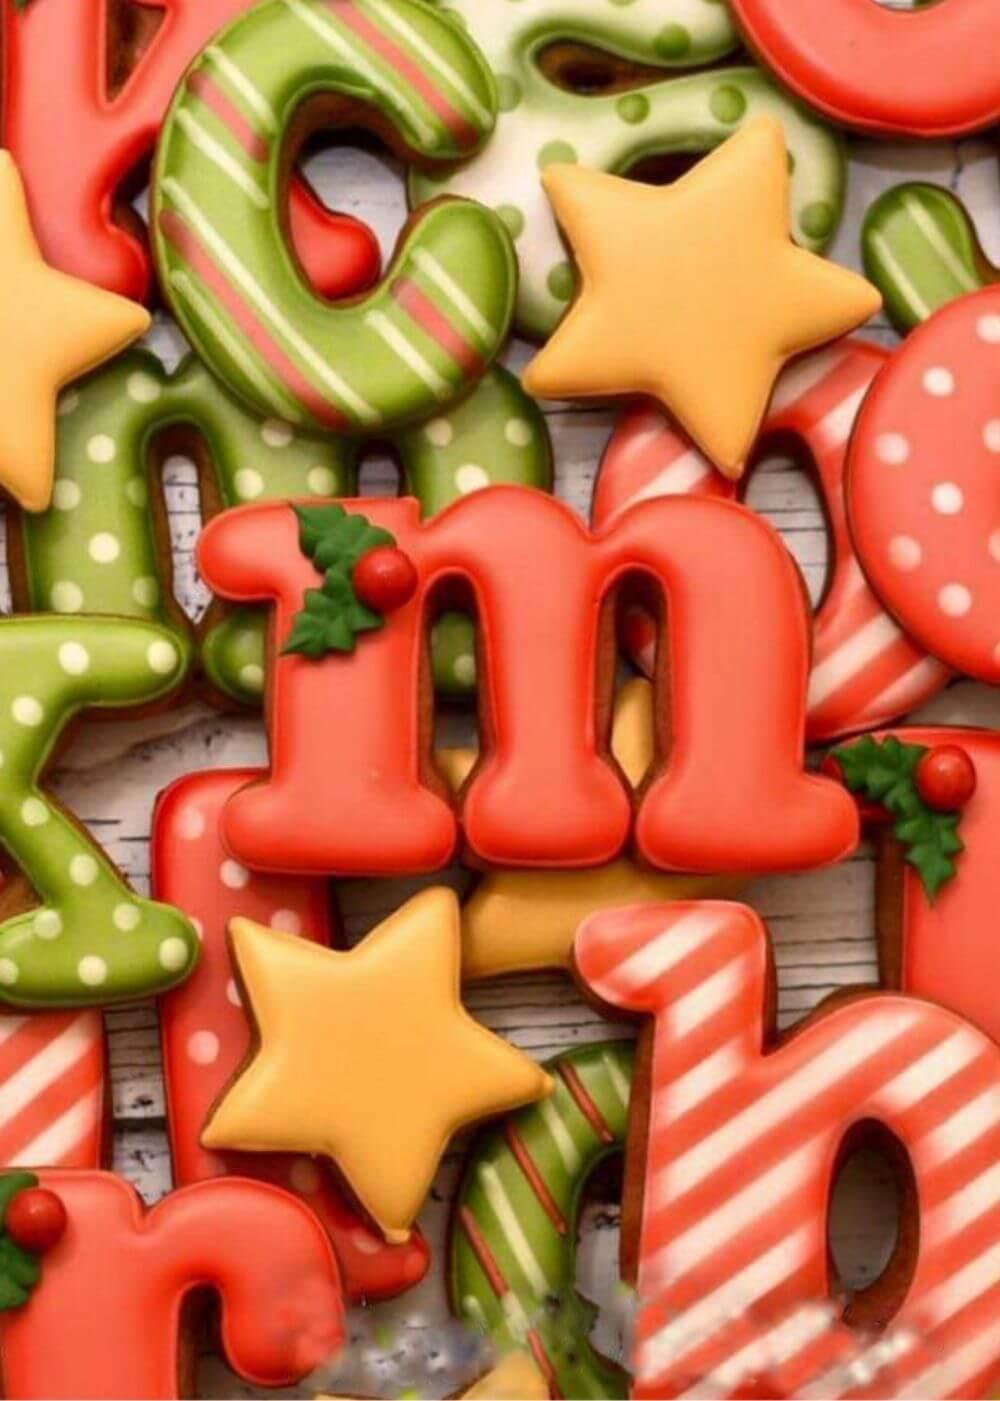 Name-Christmas Letters_Tag-Celebrations Vignettes_Season-Winter Christmas-2